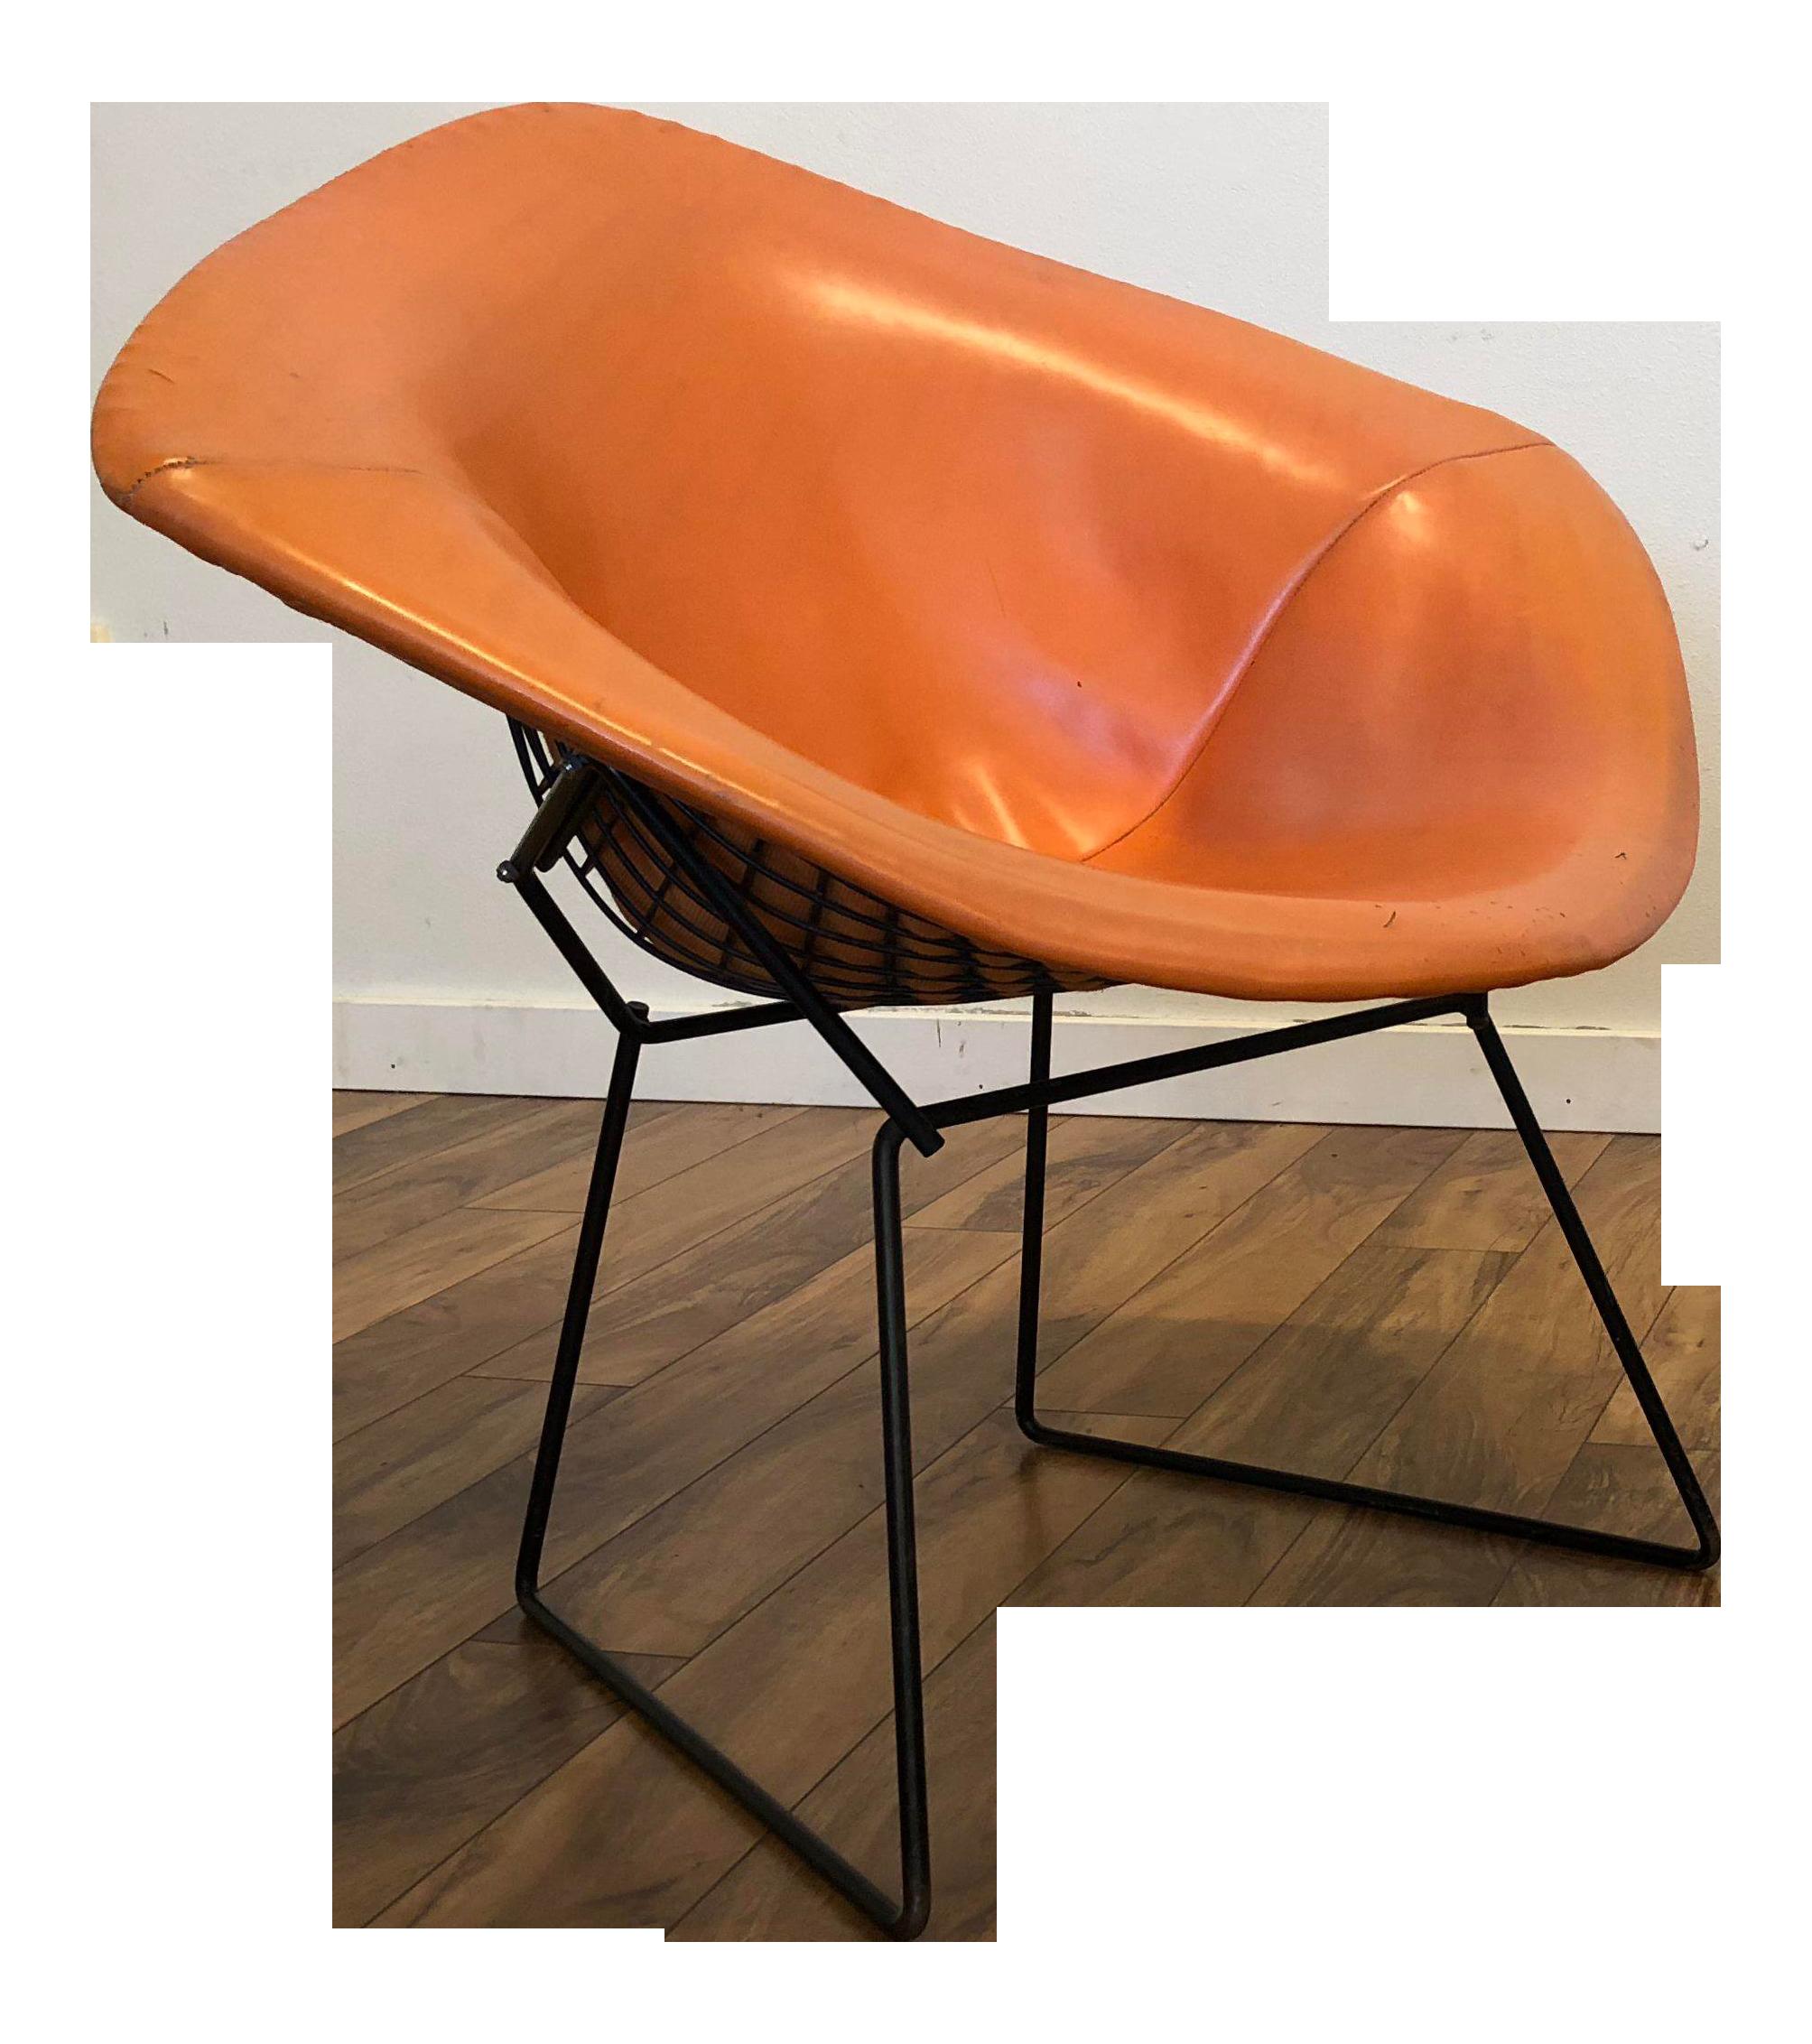 Bertoia For Knoll Black Diamond Chair With Original Orange Cover   Chairish